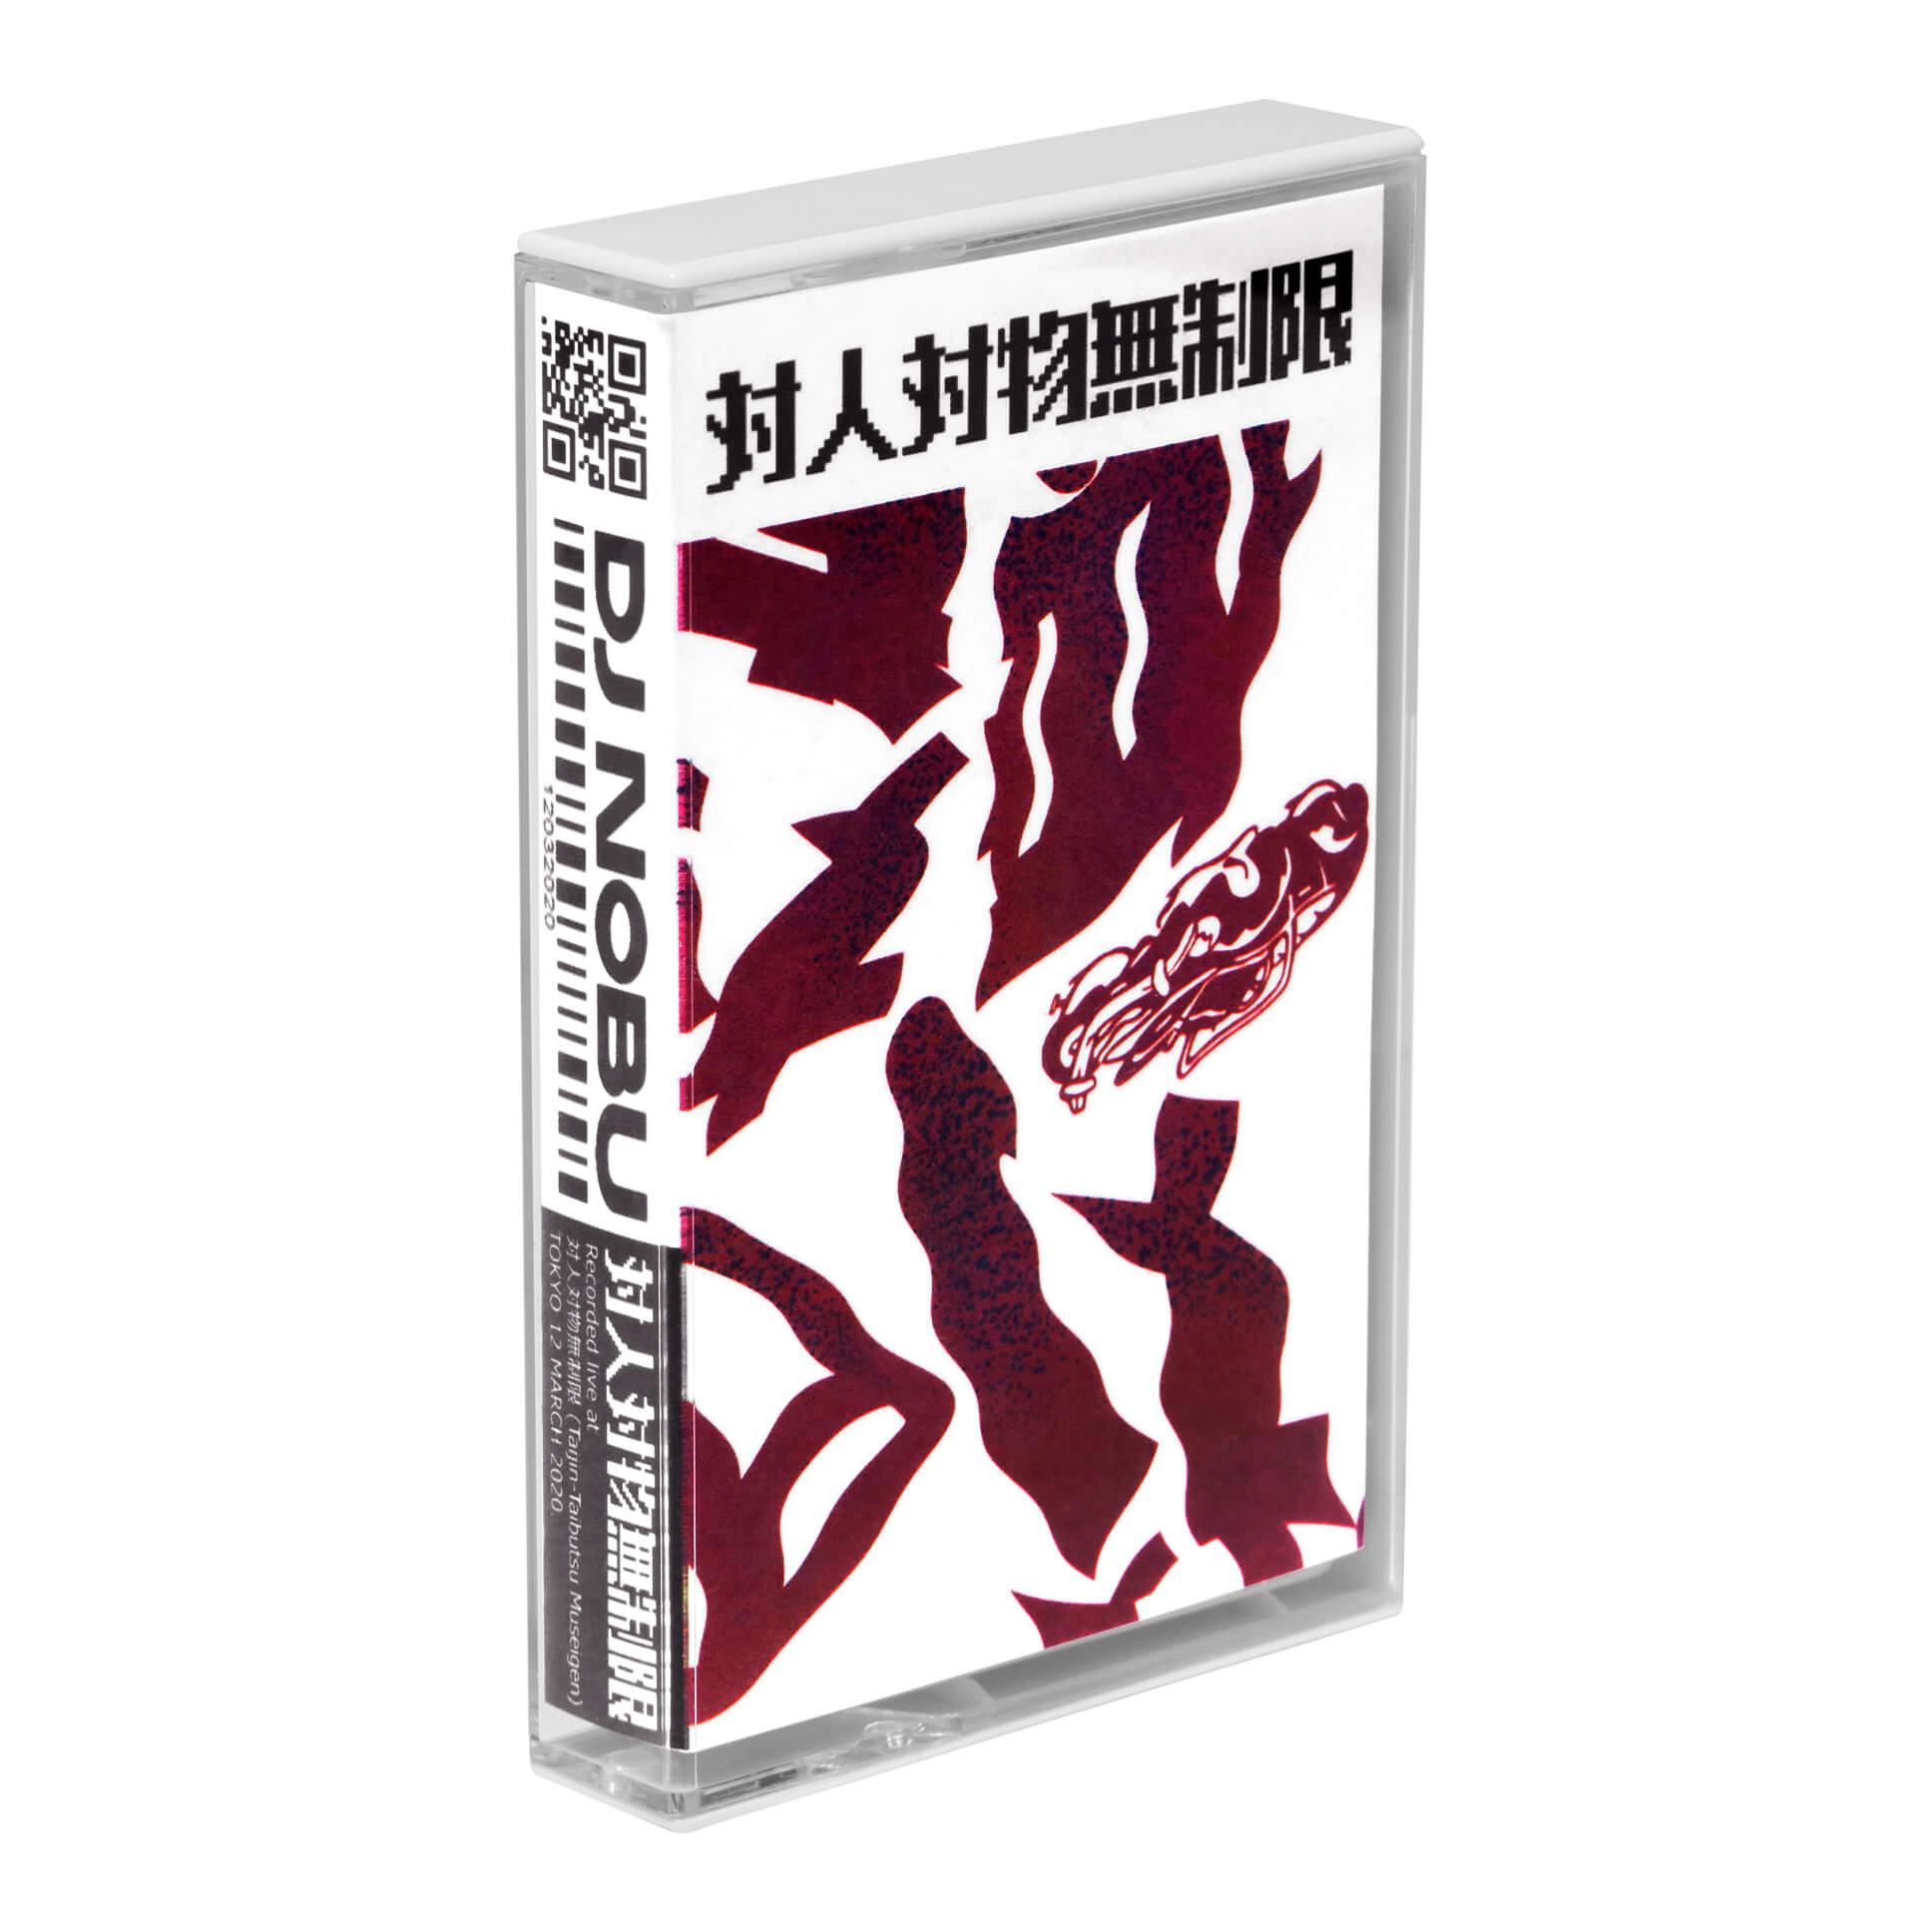 DJ NOBU - Recorded live at 対人対物無制限 (Taijin-Taibutsu Museigen) Tokyo, 12 March 2020